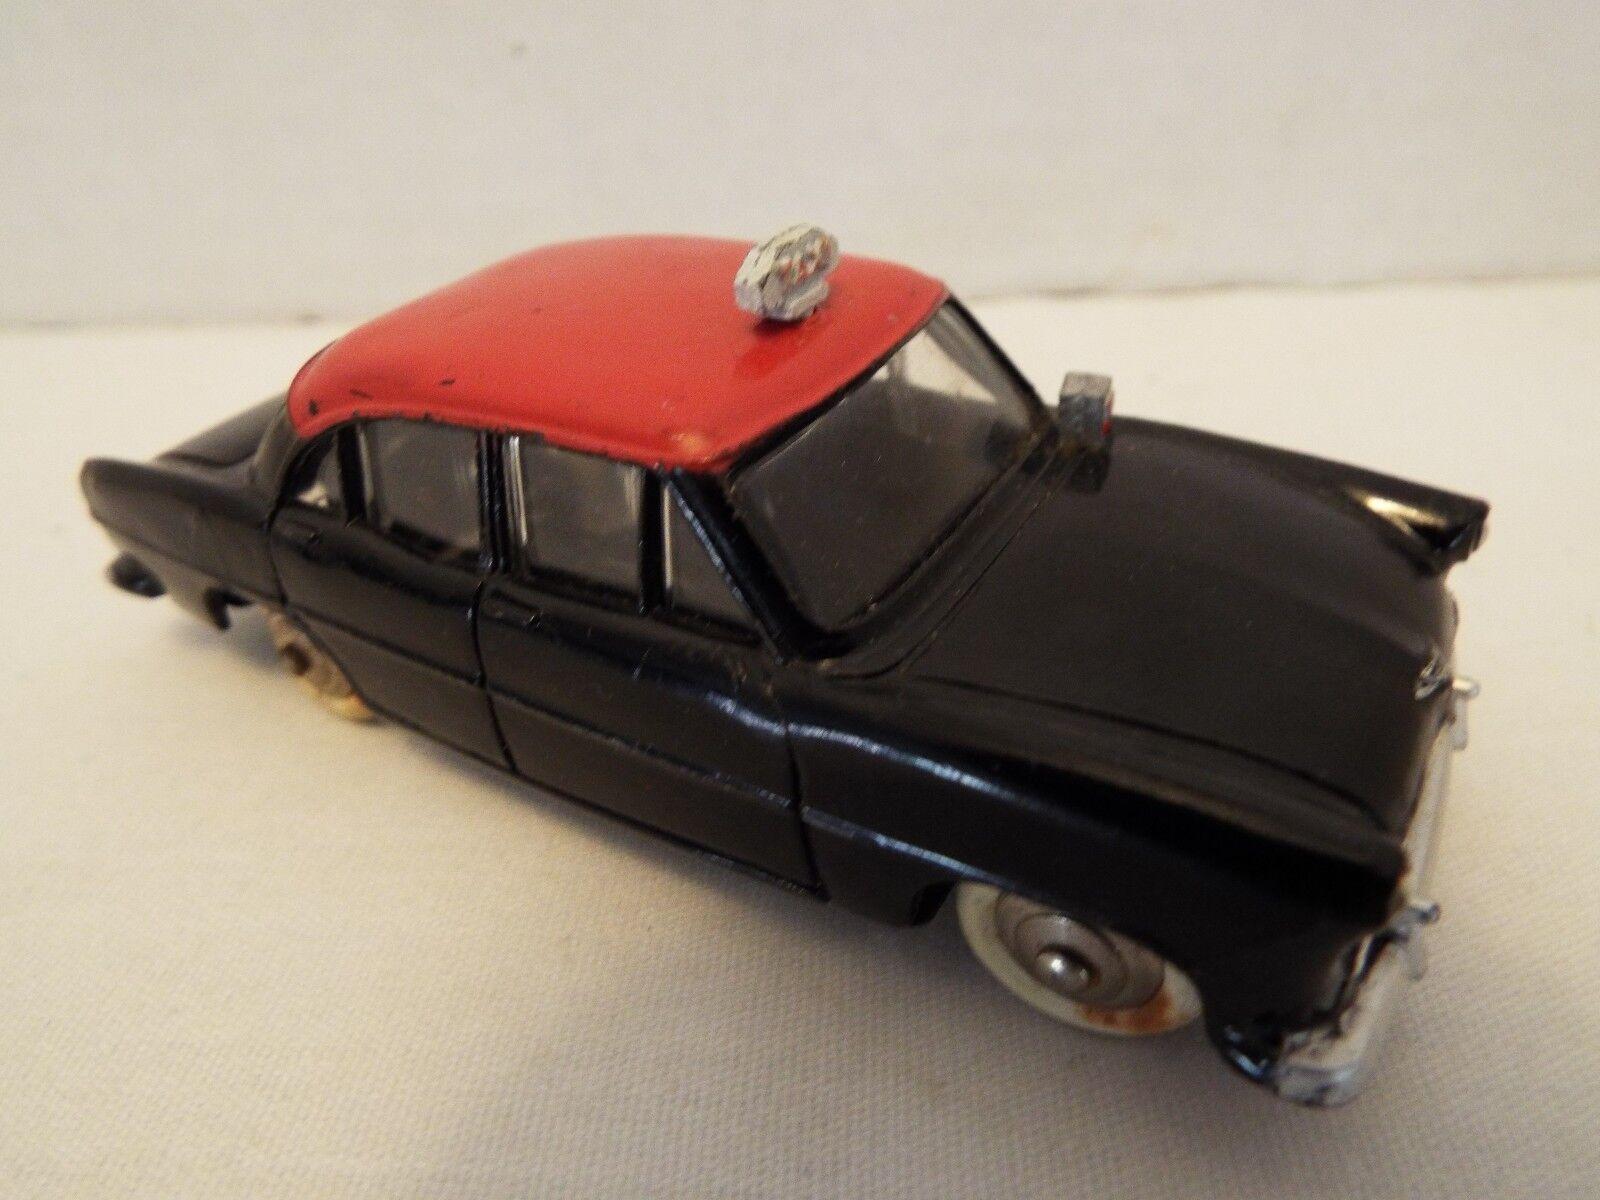 Vintage Dinky Juguetes Simca Ariane Negro Rojo Taxi década de 1960 Francia